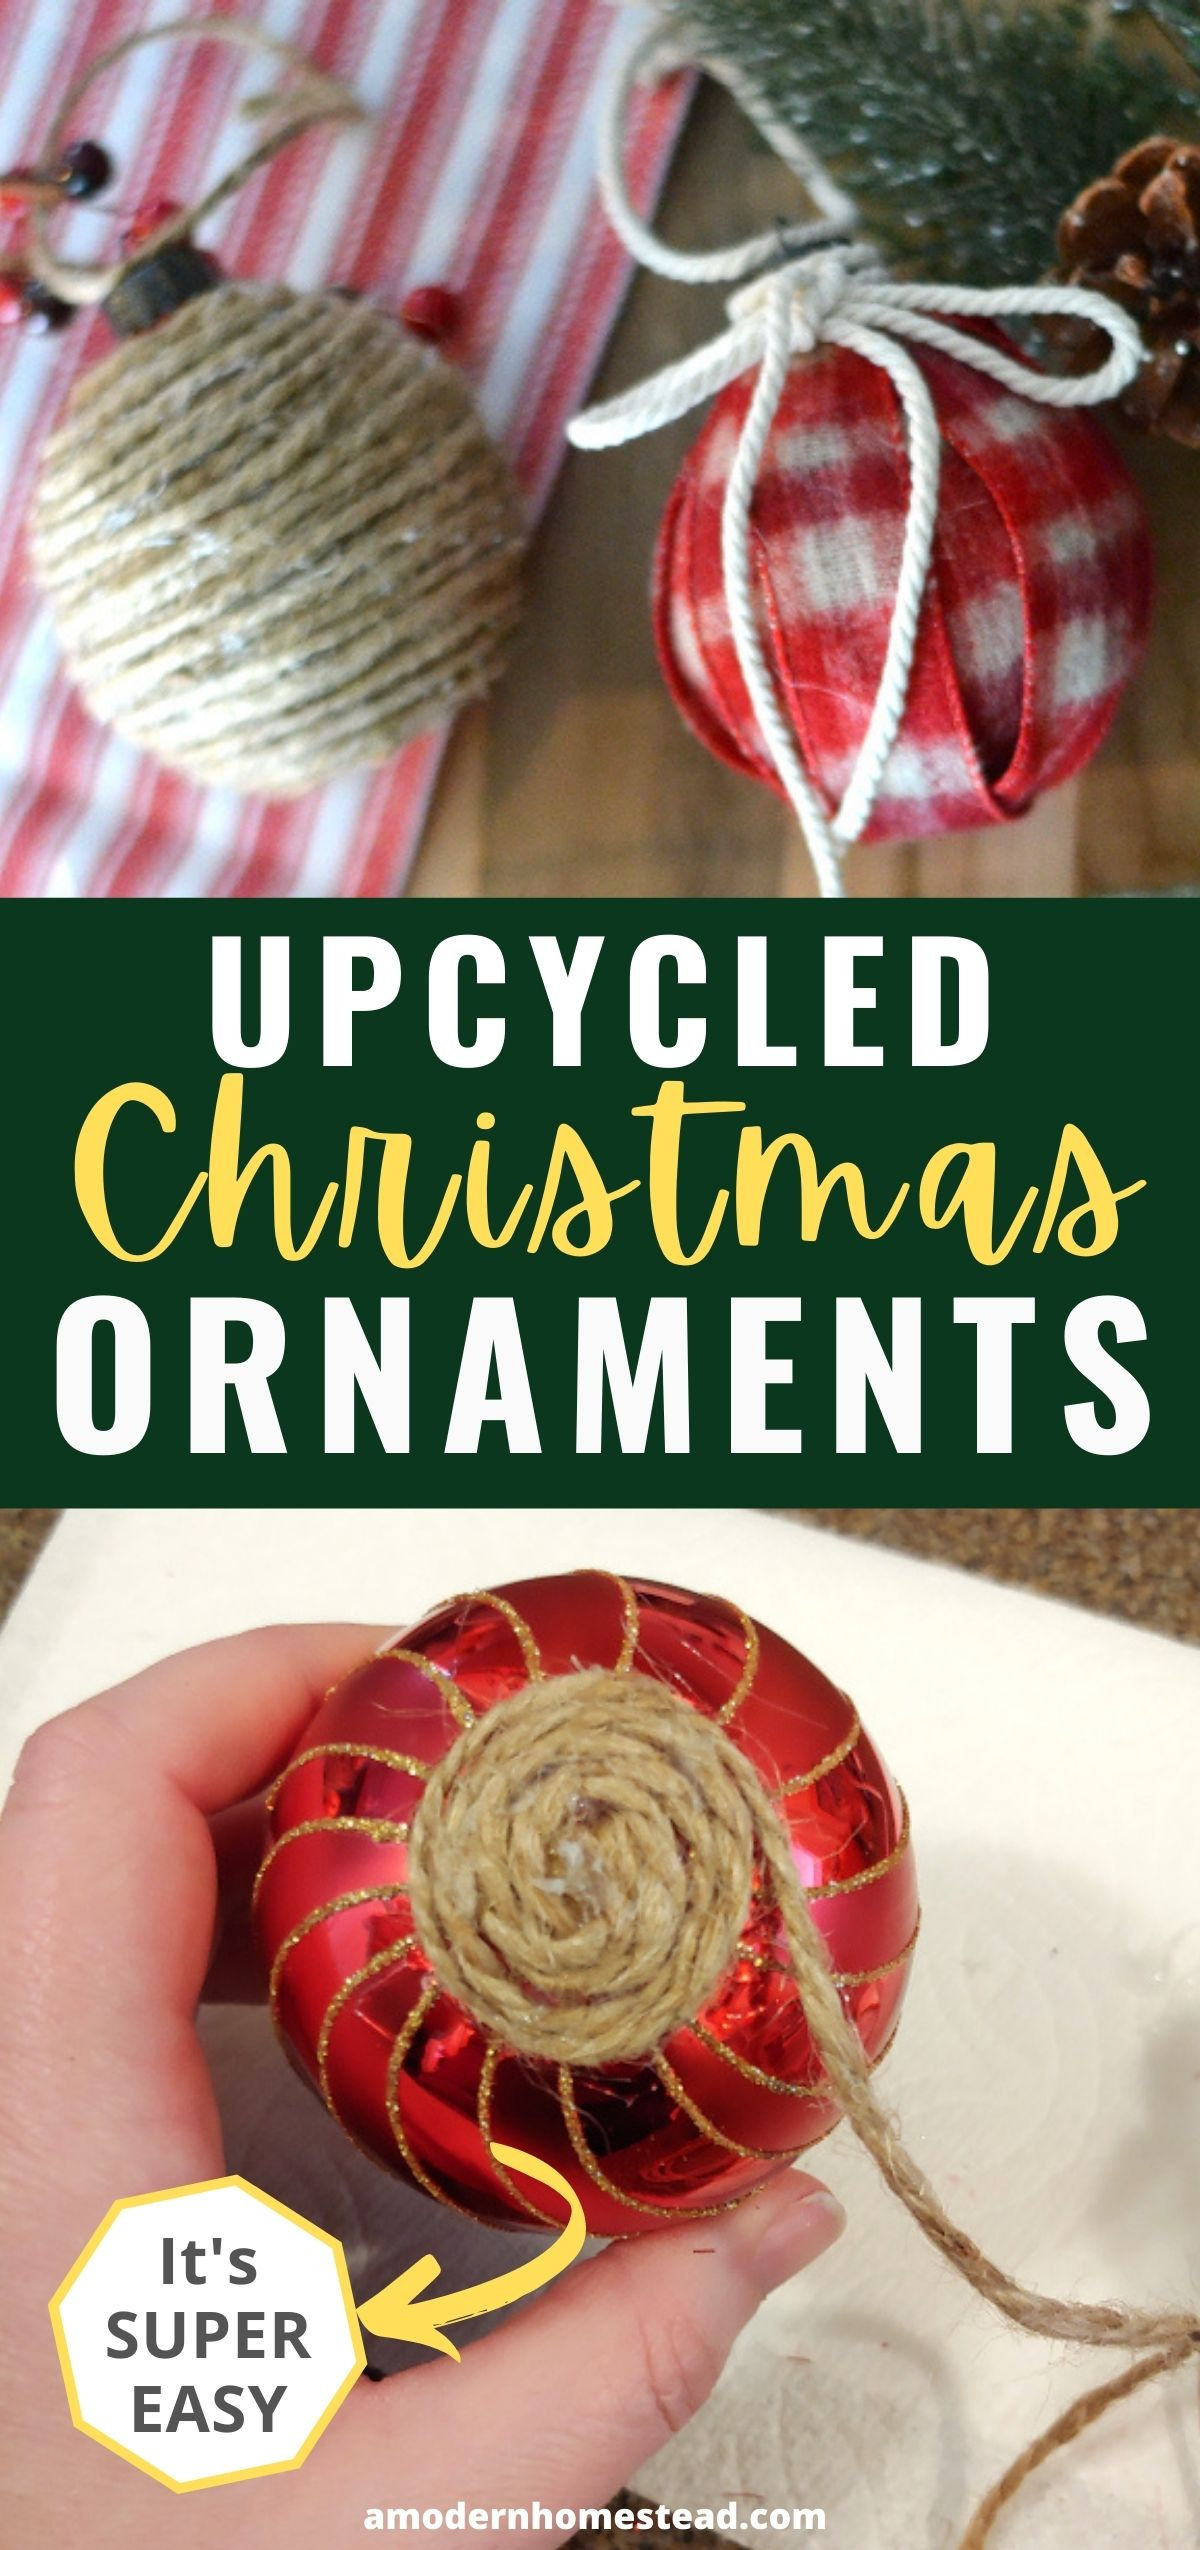 upcycled DIY christmas ornaments pinnable image